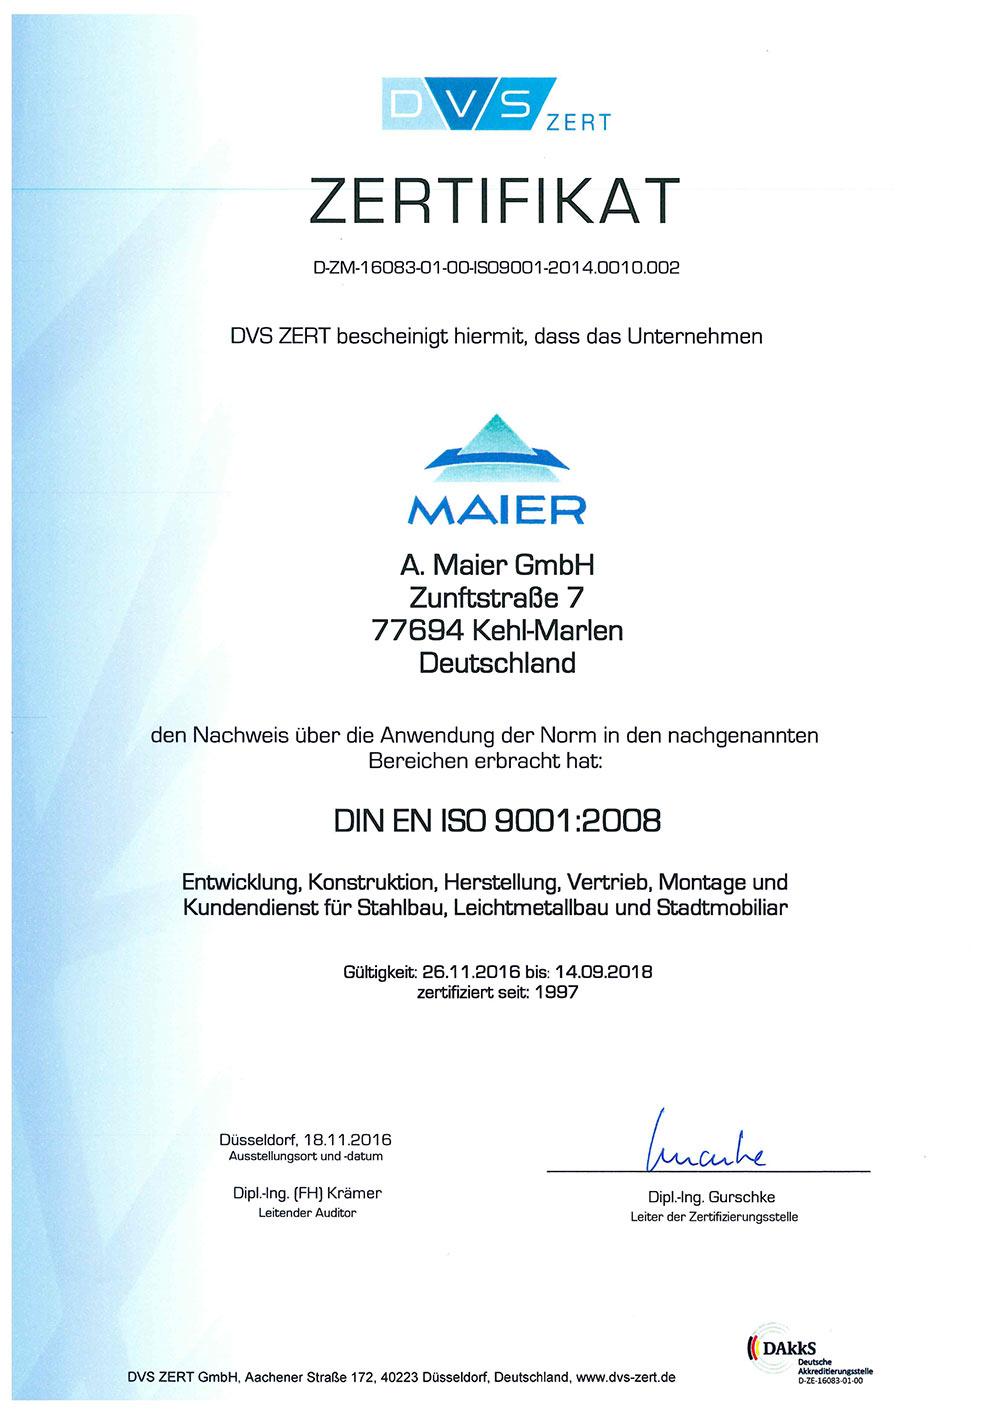 Zertifikat_9001__A_Maier_GmbH_bis_09_2018-1_Seite1